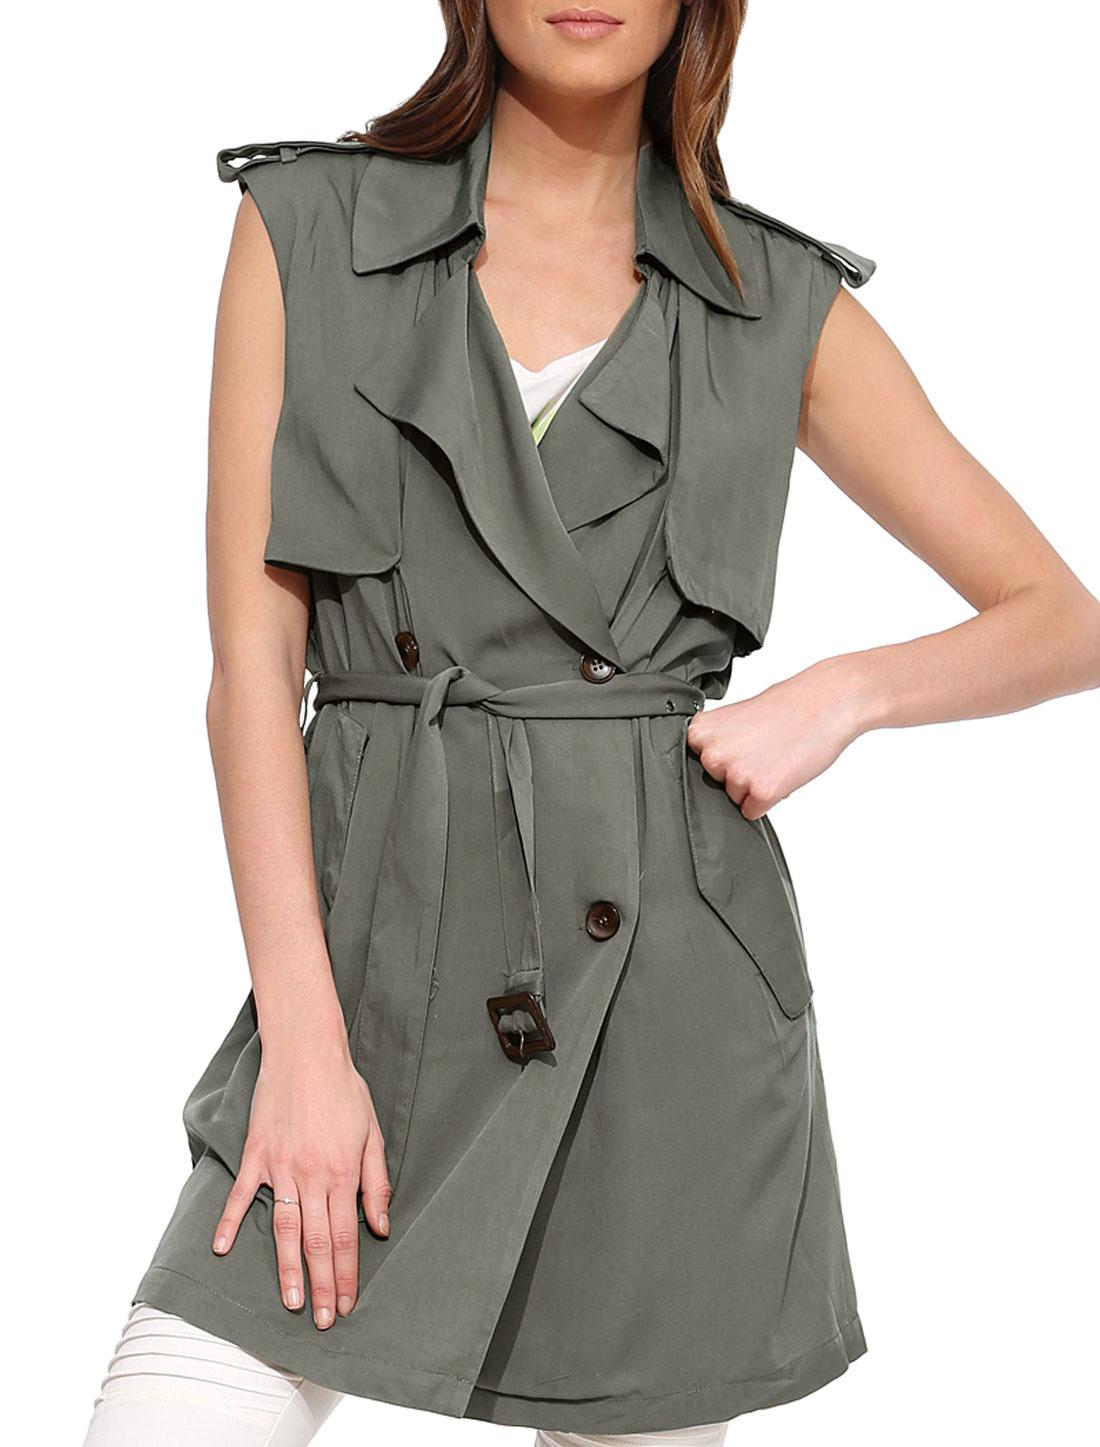 Women Button-Tab Epaulets Overlay Upper Sleeveless Jacket w Belt Gray S